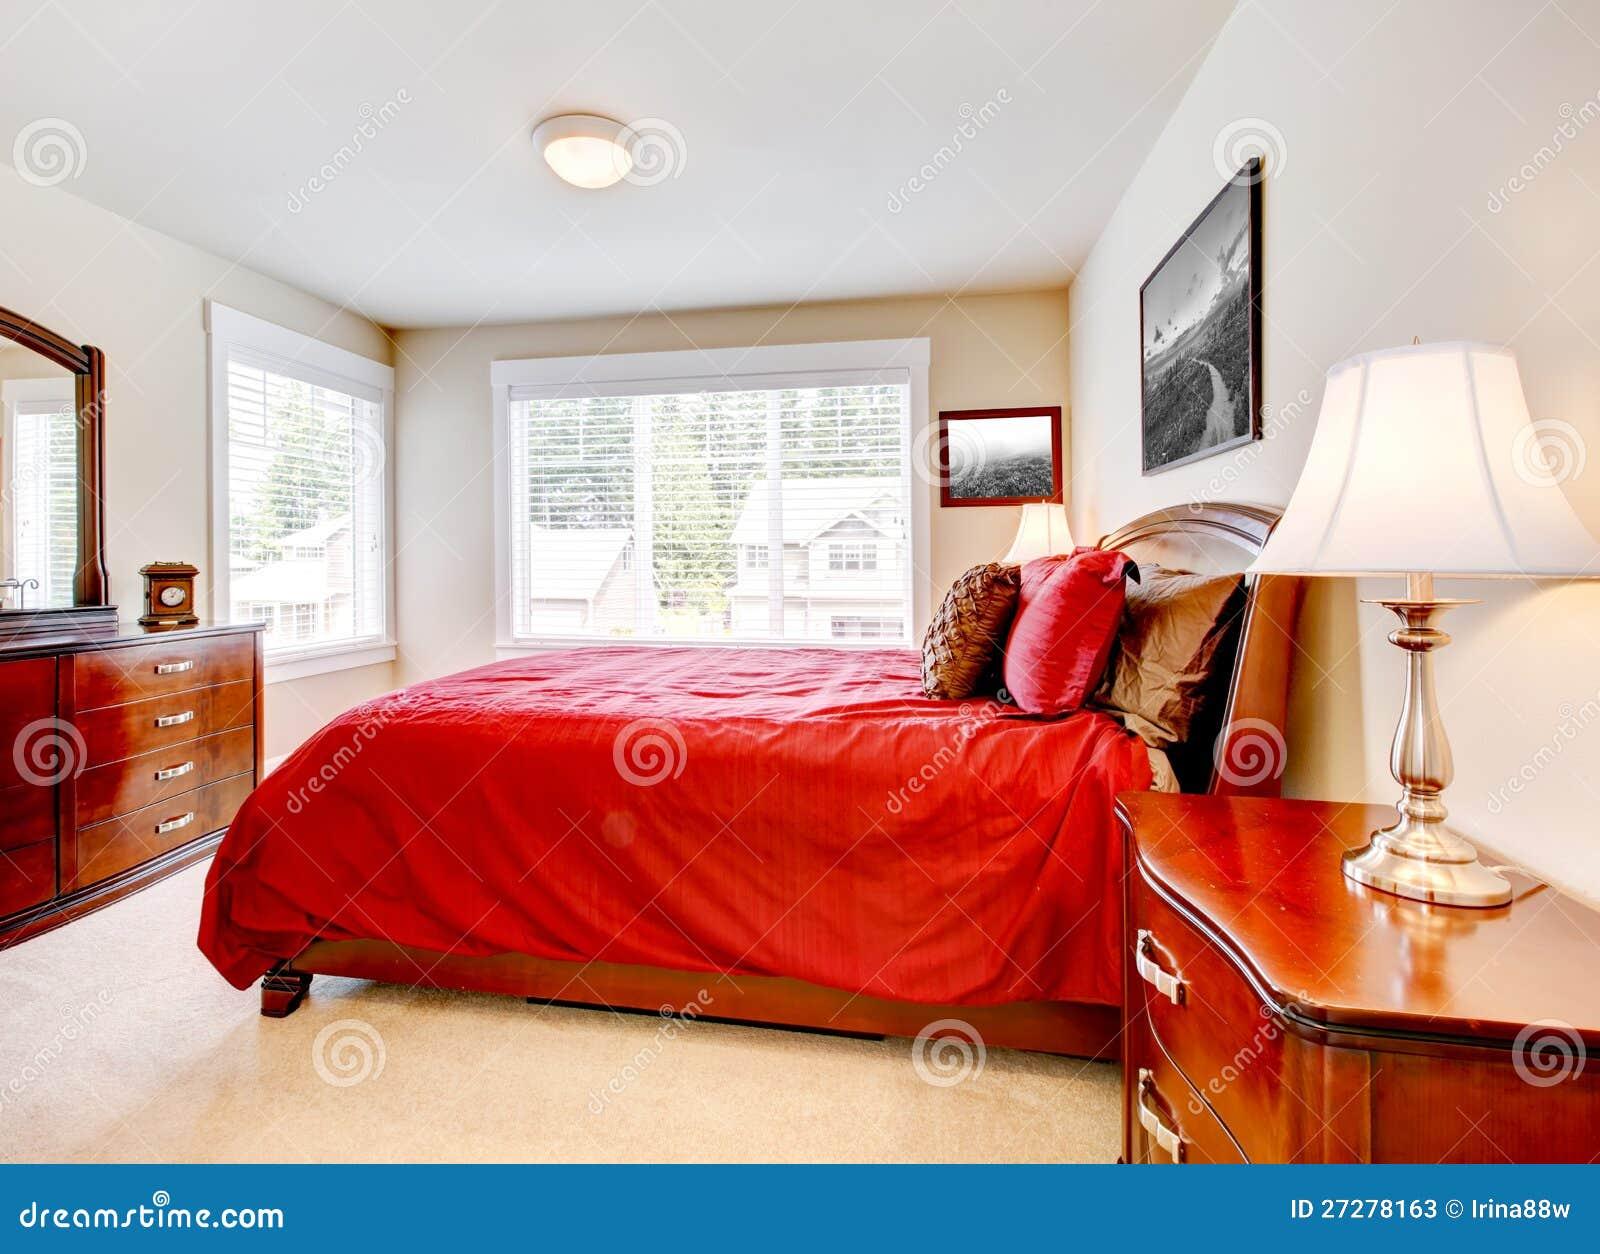 Slaapkamer met twee vensters en rood bed stock foto's   afbeelding ...